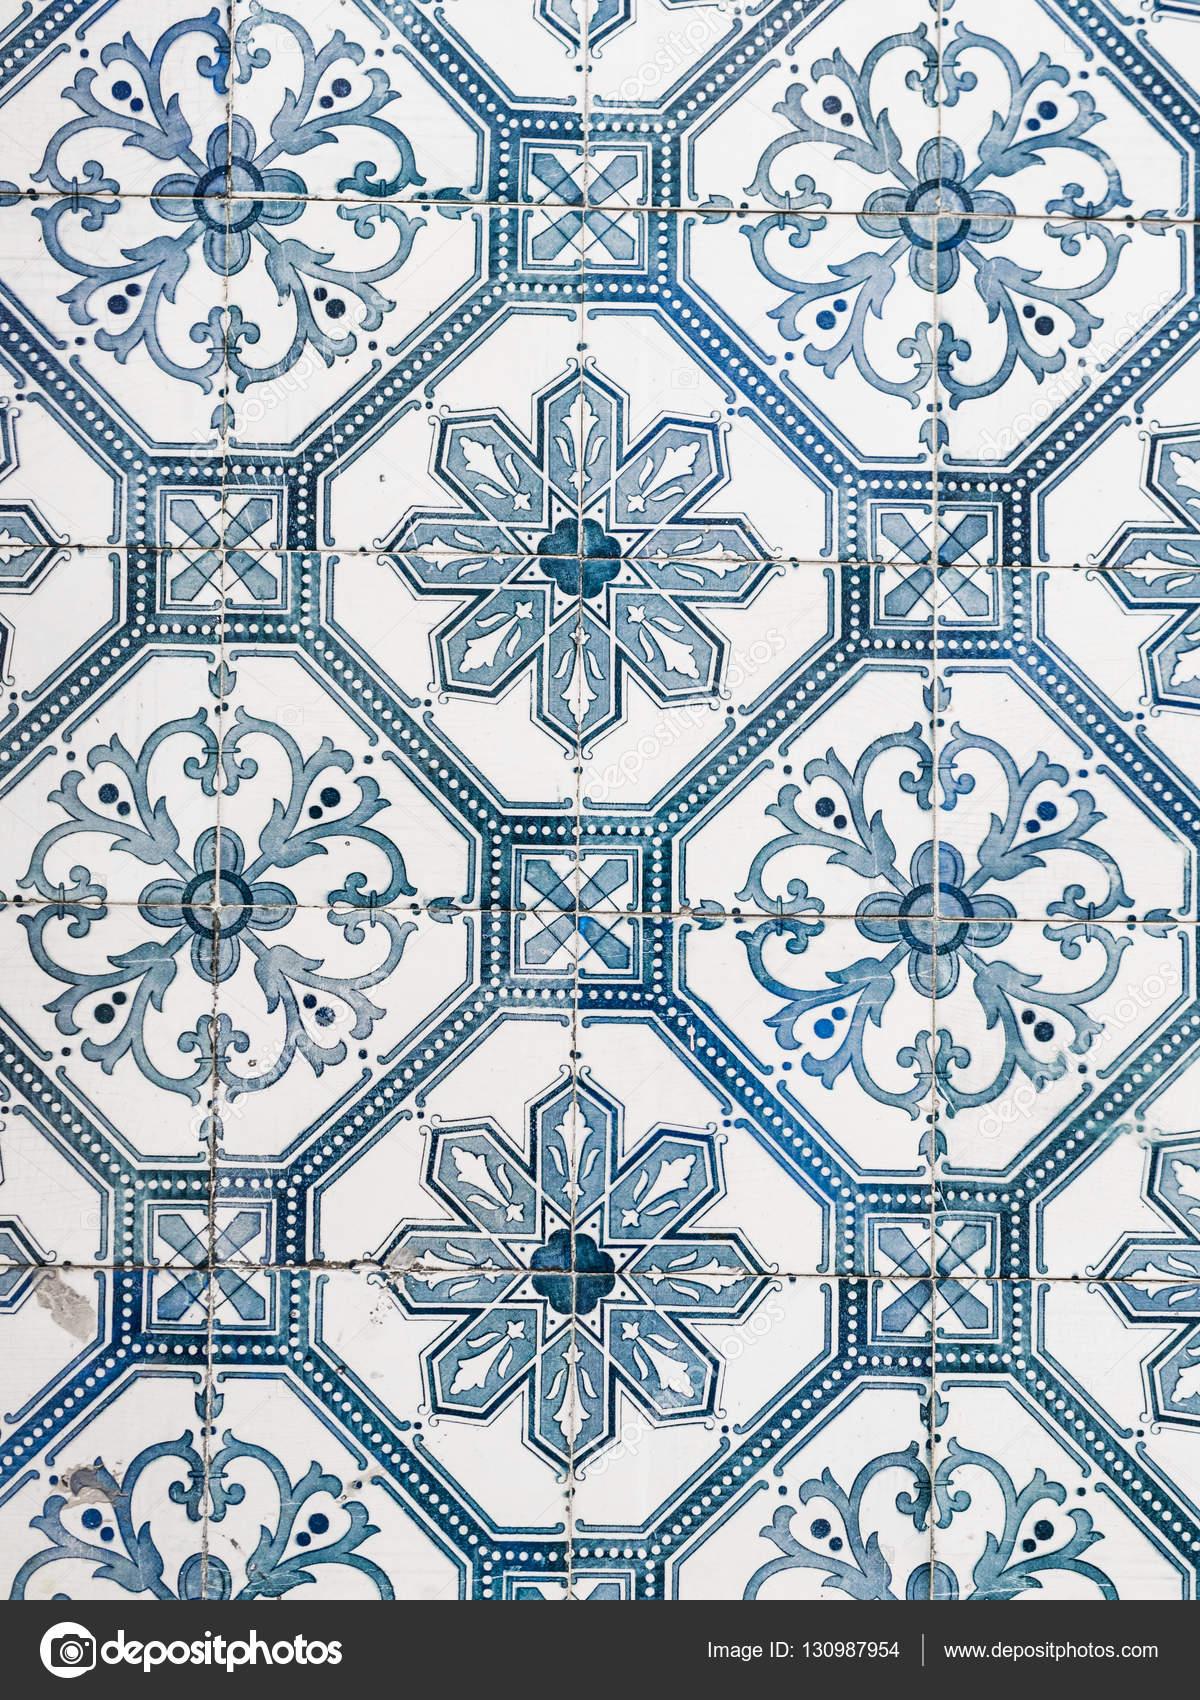 Cer mica azulejos portugueses foto de stock 130987954 - Azulejos portugueses comprar ...